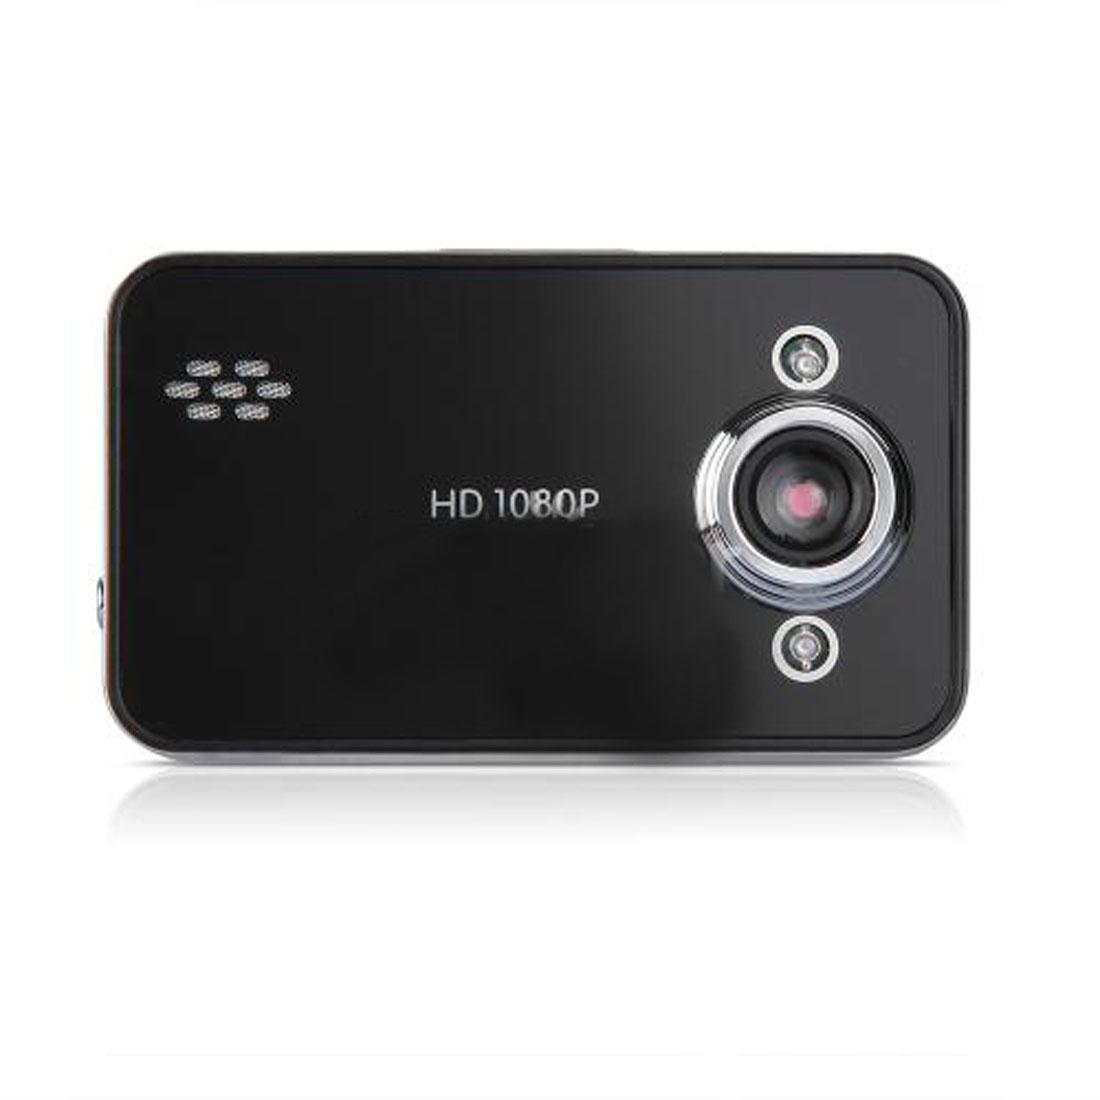 Hot Sale 2.7 inch TFT 2 LED Car Auto DVR Cam Camera Video Recorder HD 720P Night Vision Vehicle Camcorder ambarella a7 la70(China (Mainland))